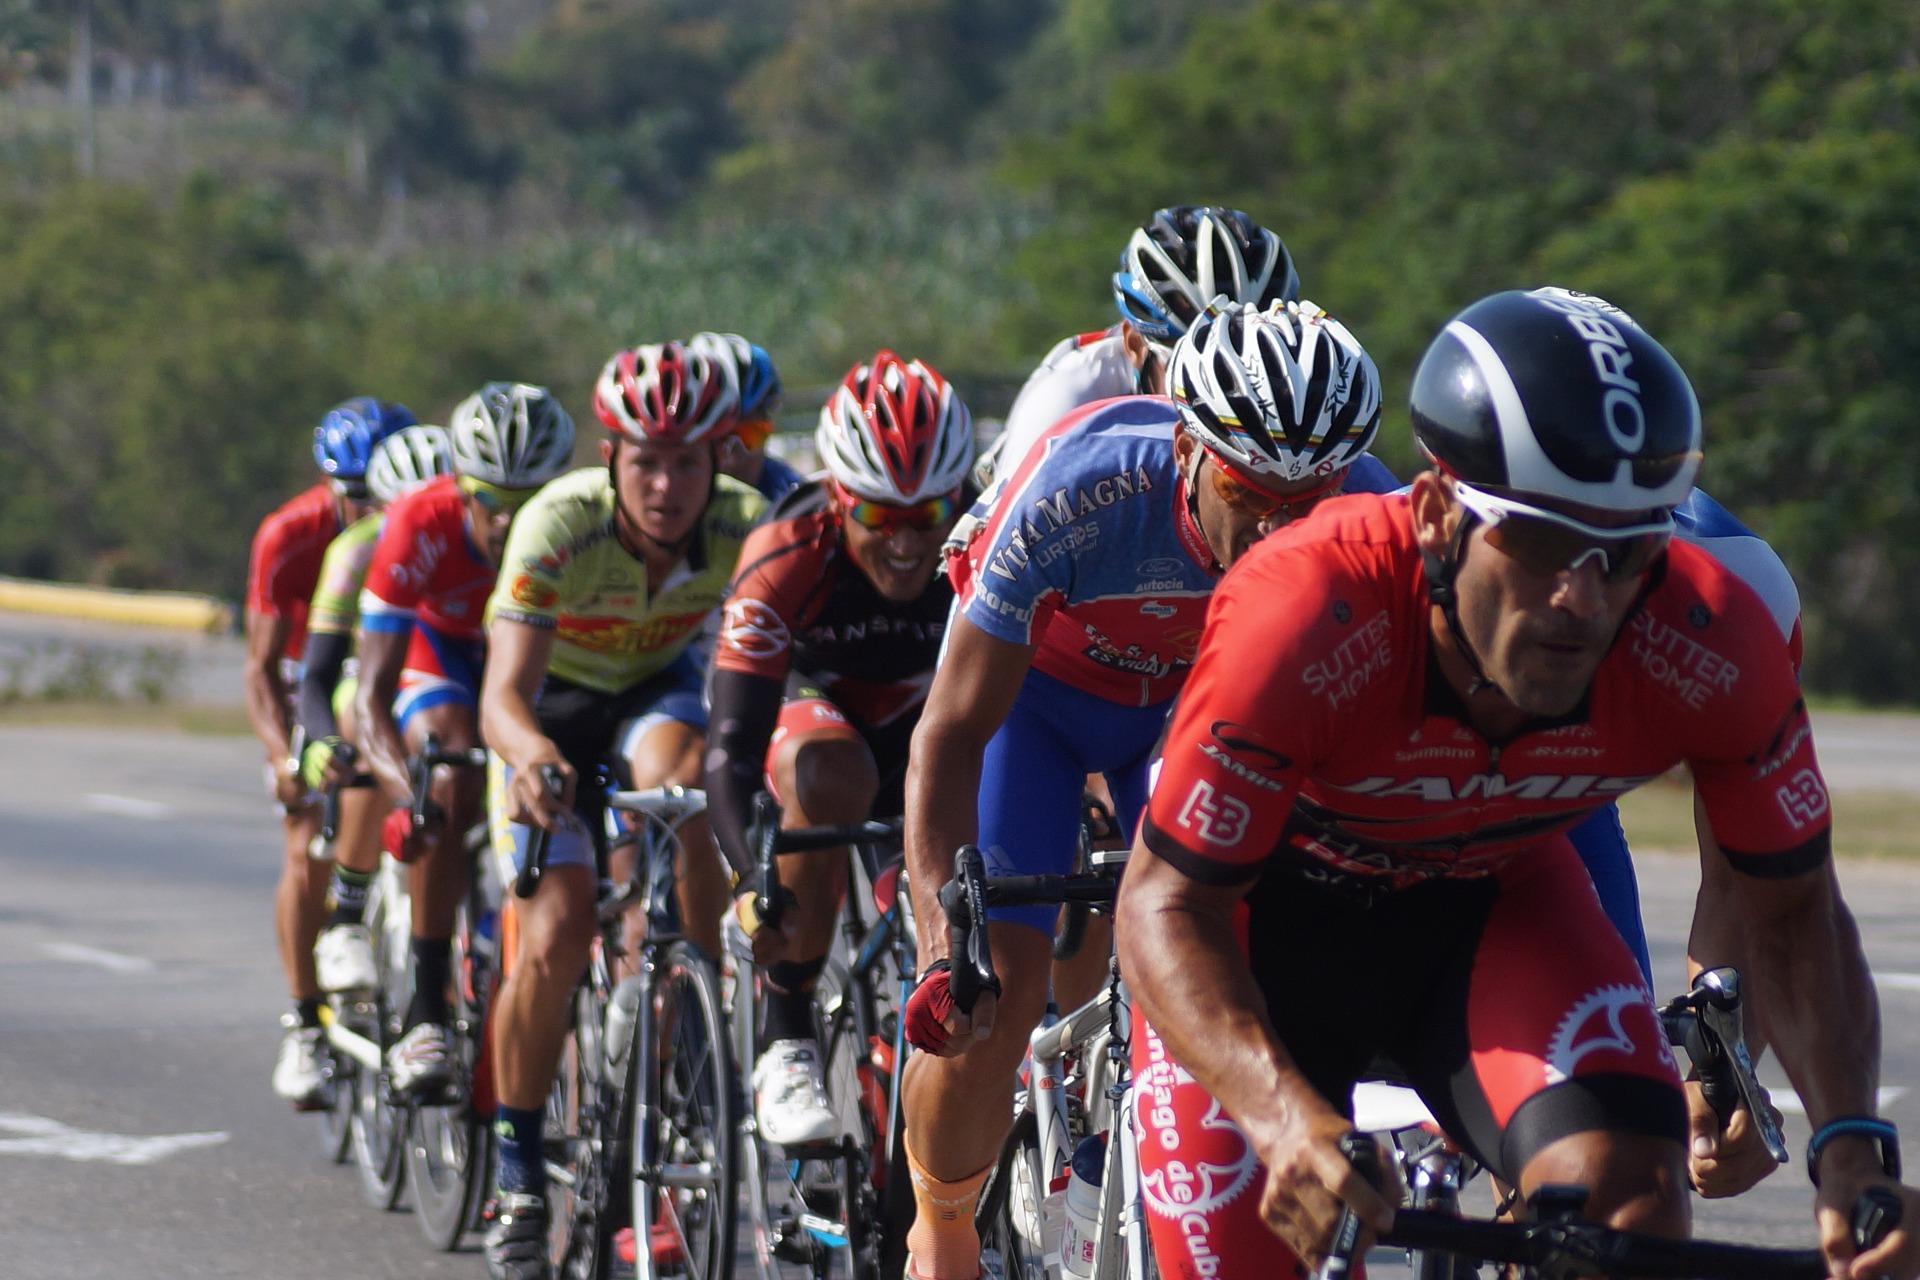 Le cyclisme en club